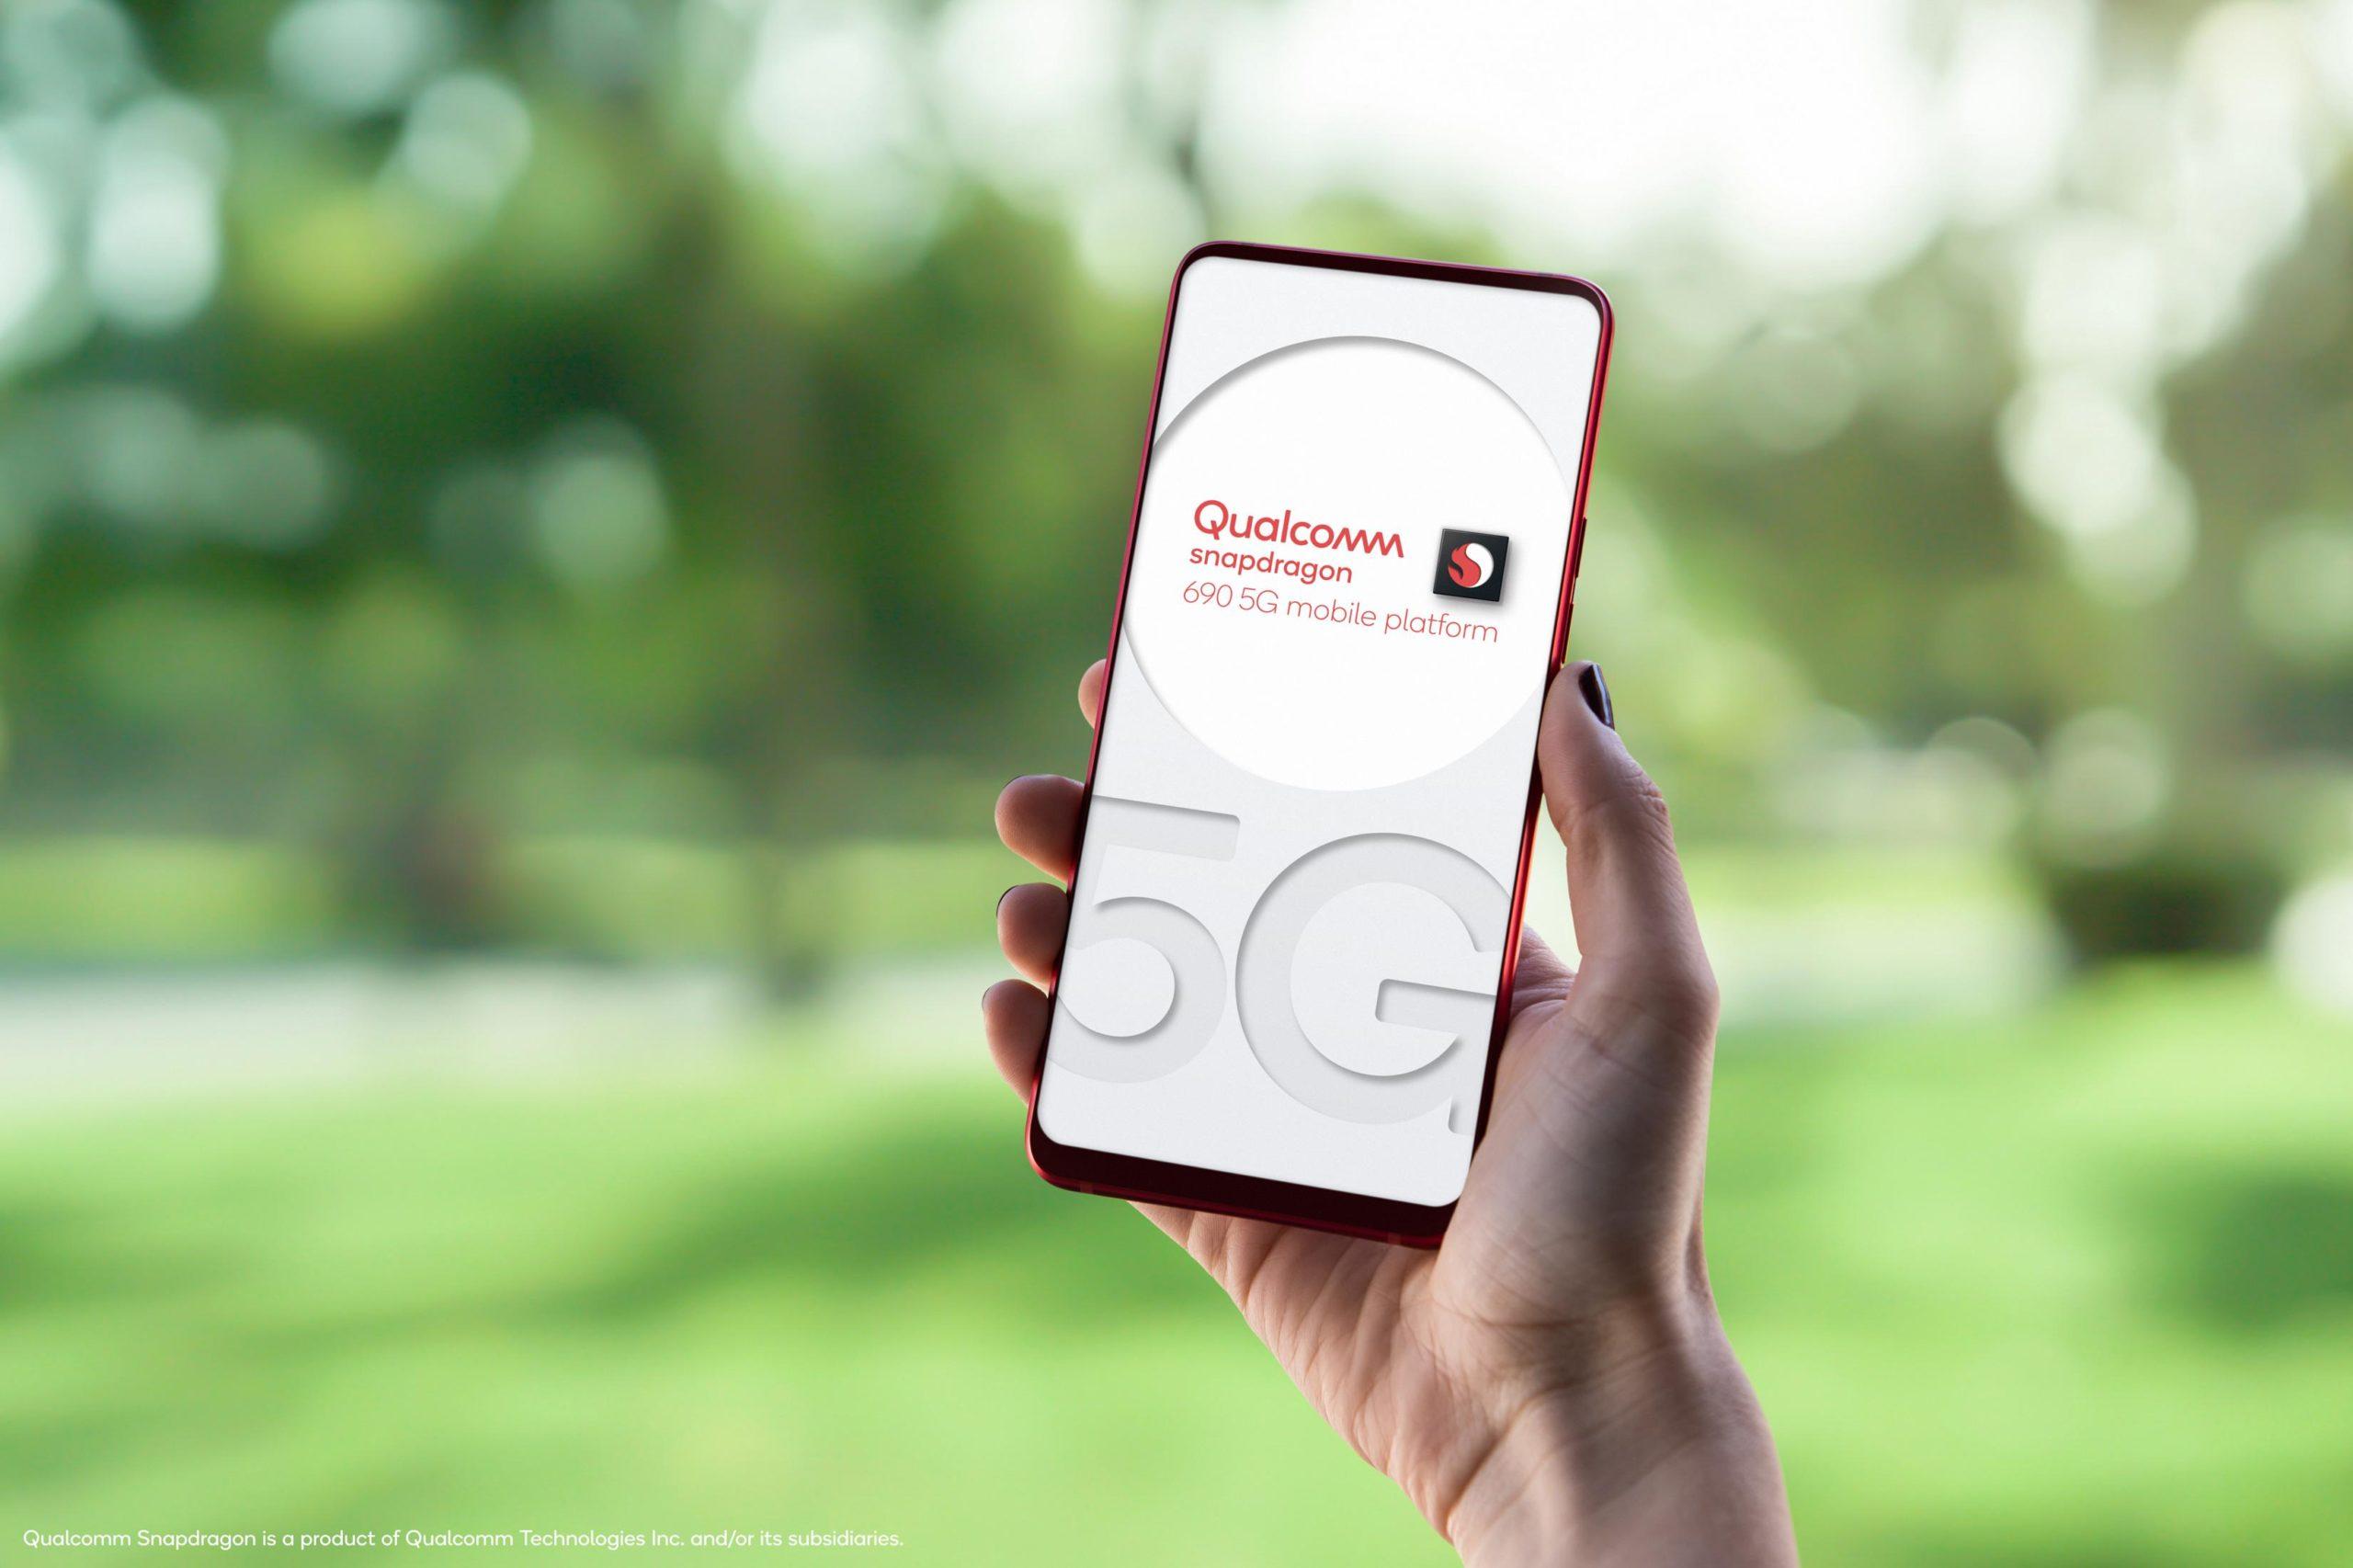 Qualcomm Snapdragon 690 5G Mobile Platformを発表、Snapdragon 6 Series初の5G通信対応製品